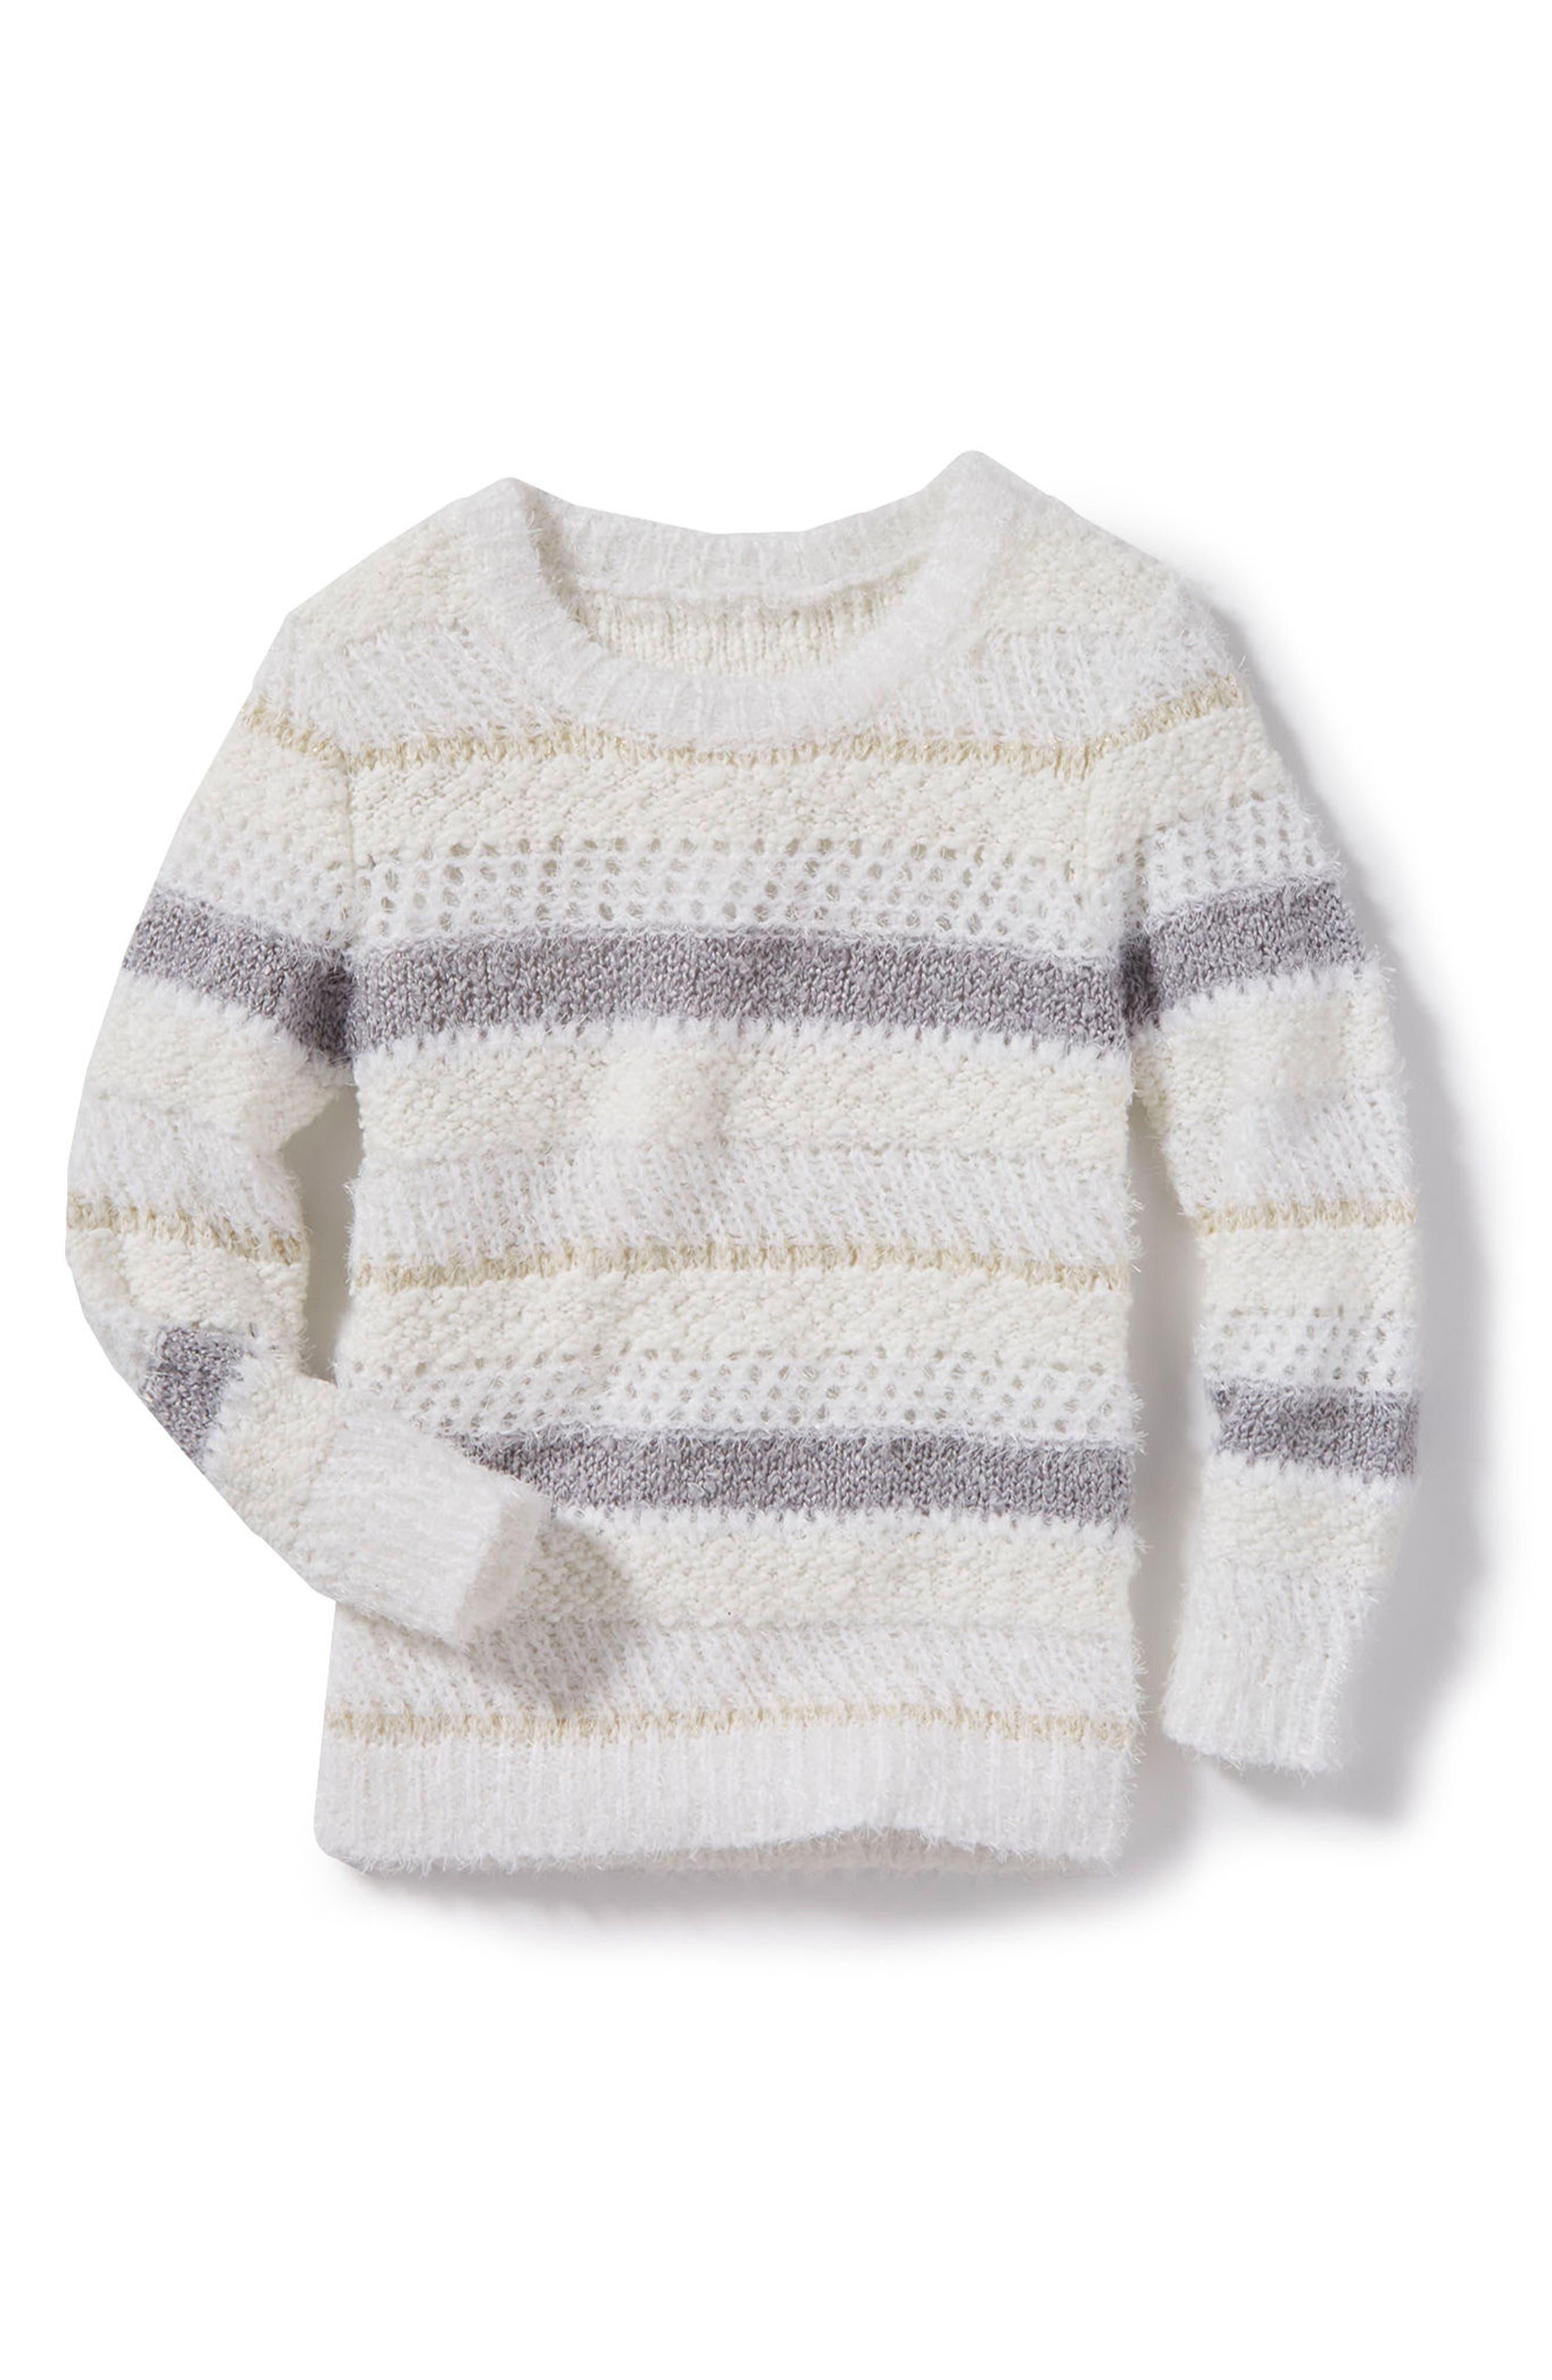 Main Image - Peek Hailey Pullover Sweater (Toddler Girls, Little Girls & Big Girls)